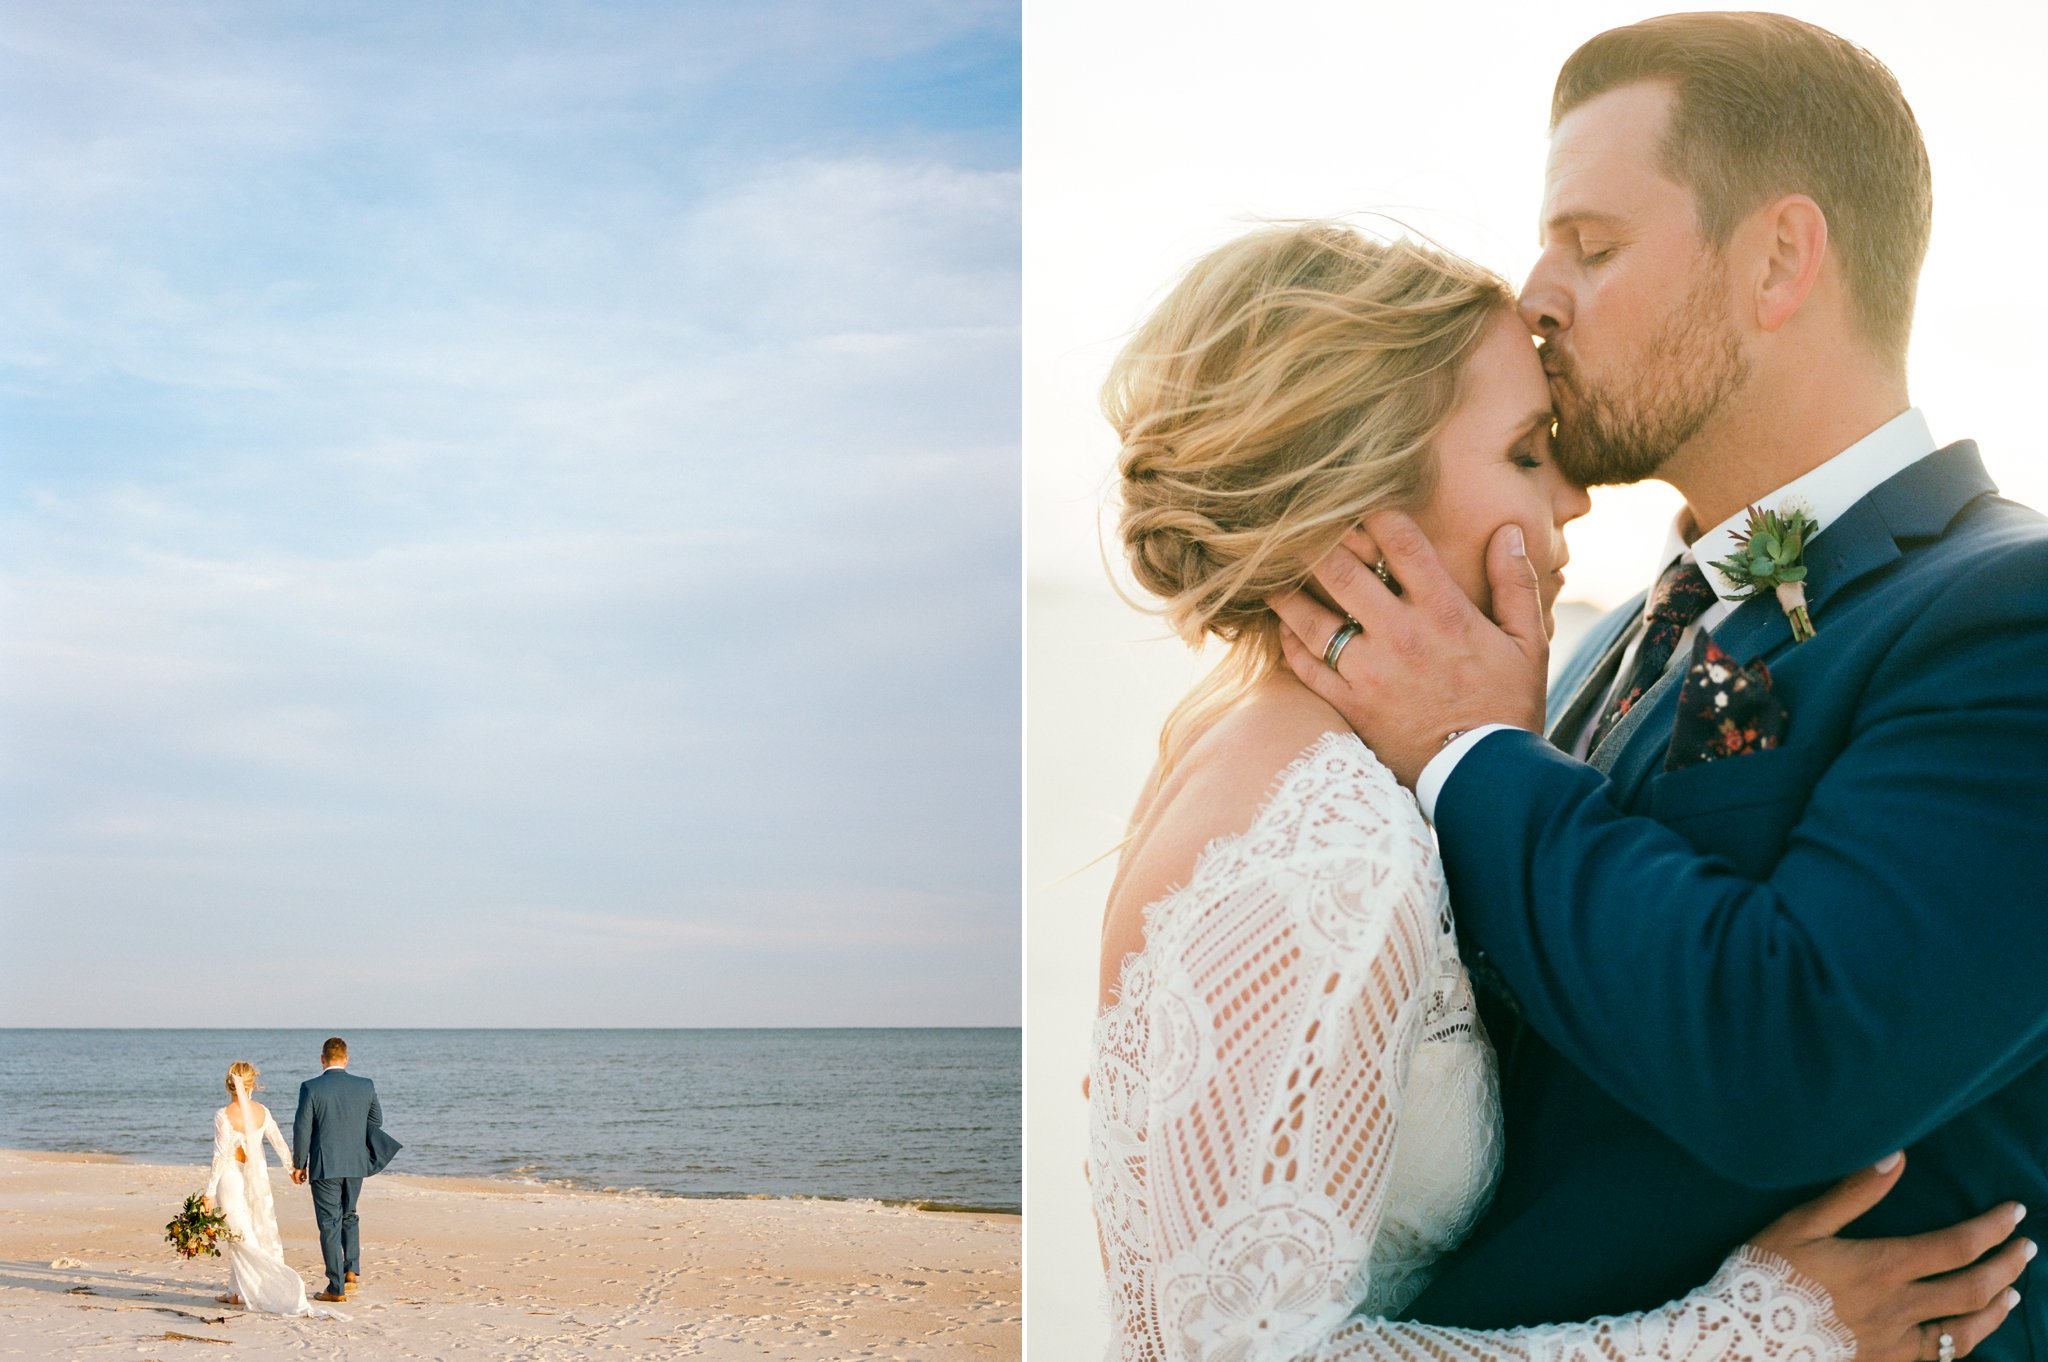 st+george+island+wedding+st+george+island+photographer+shannon+griffin+photography_0057.jpg